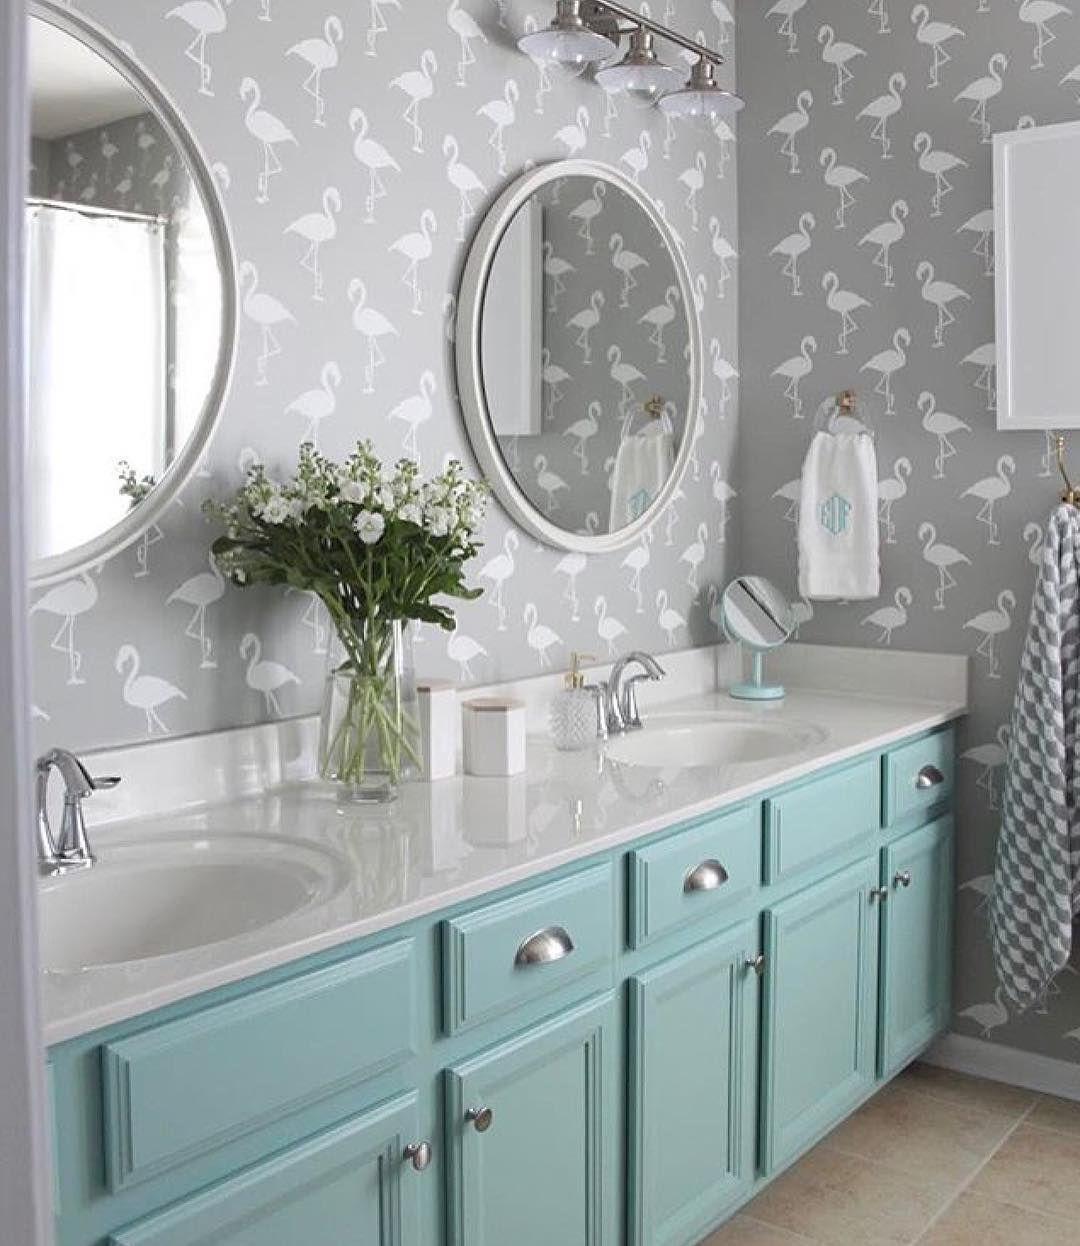 Gender Neutral Kids Bathroom With Stenciled Flamingo Walls And Painted Vanity